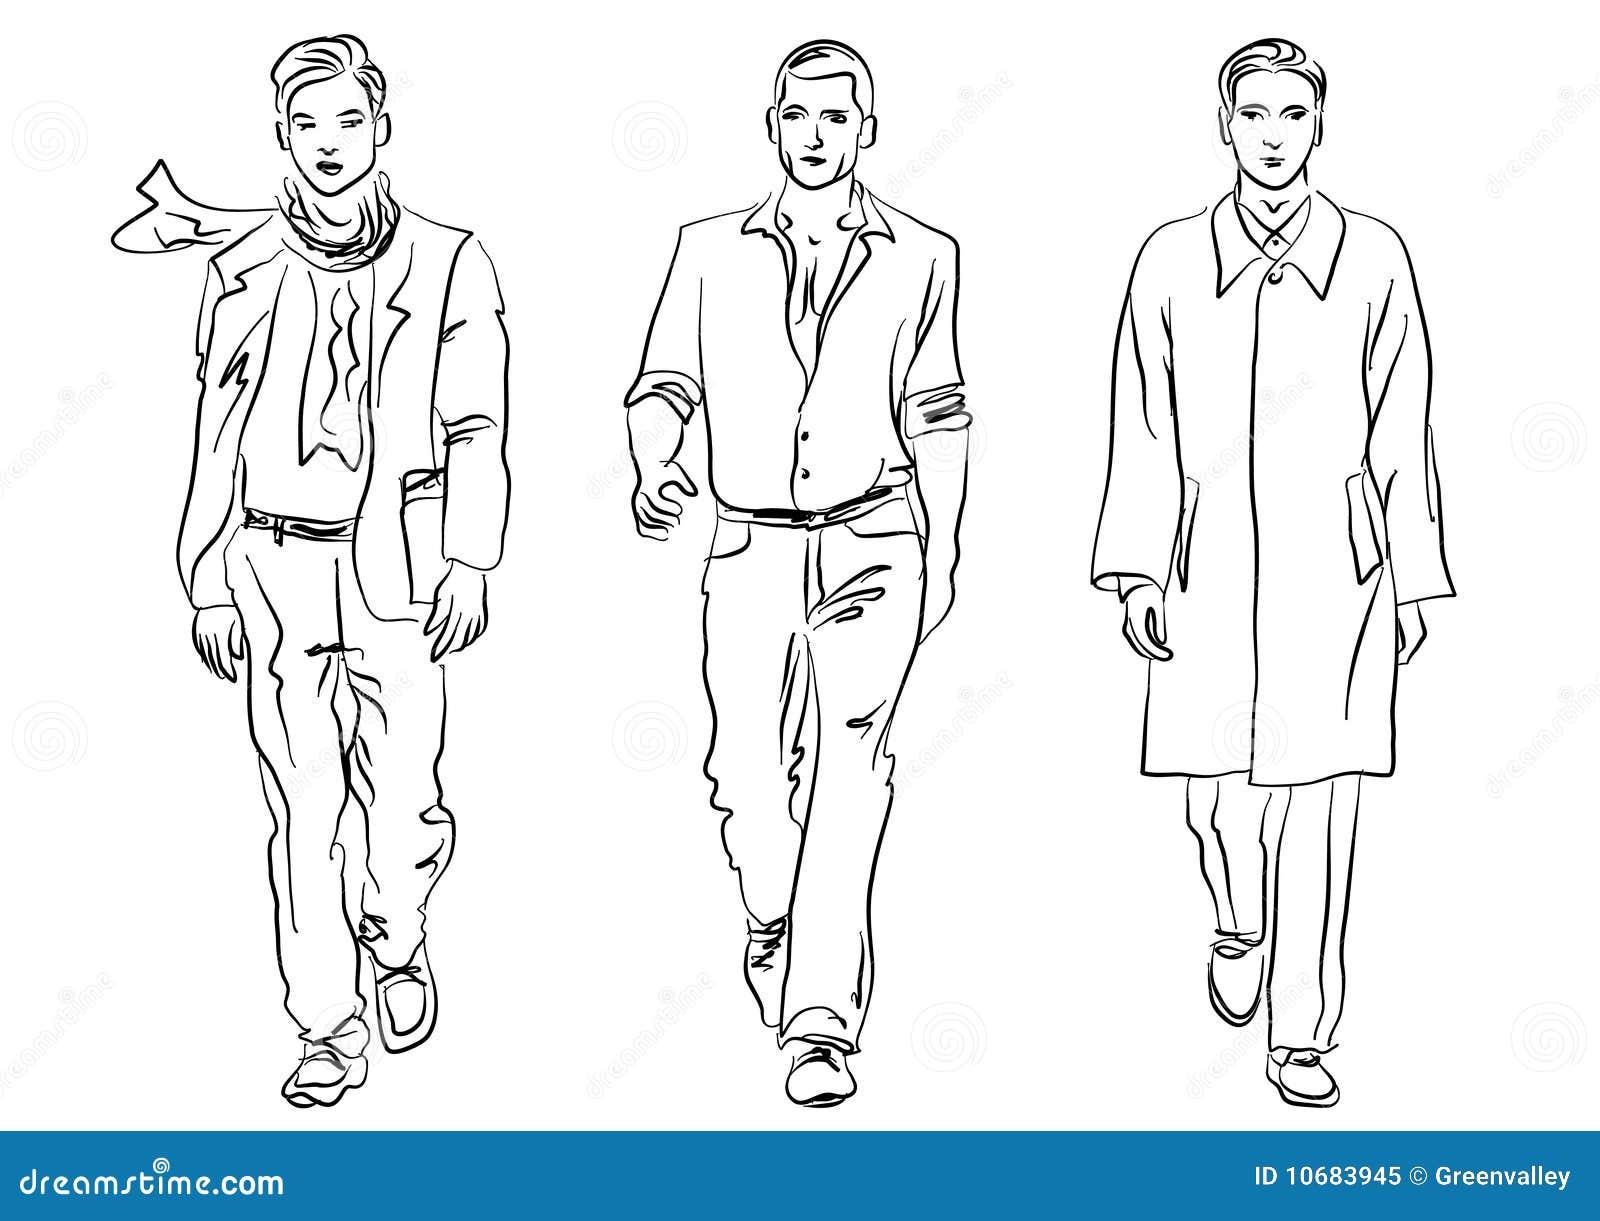 Fashion illustration face templates